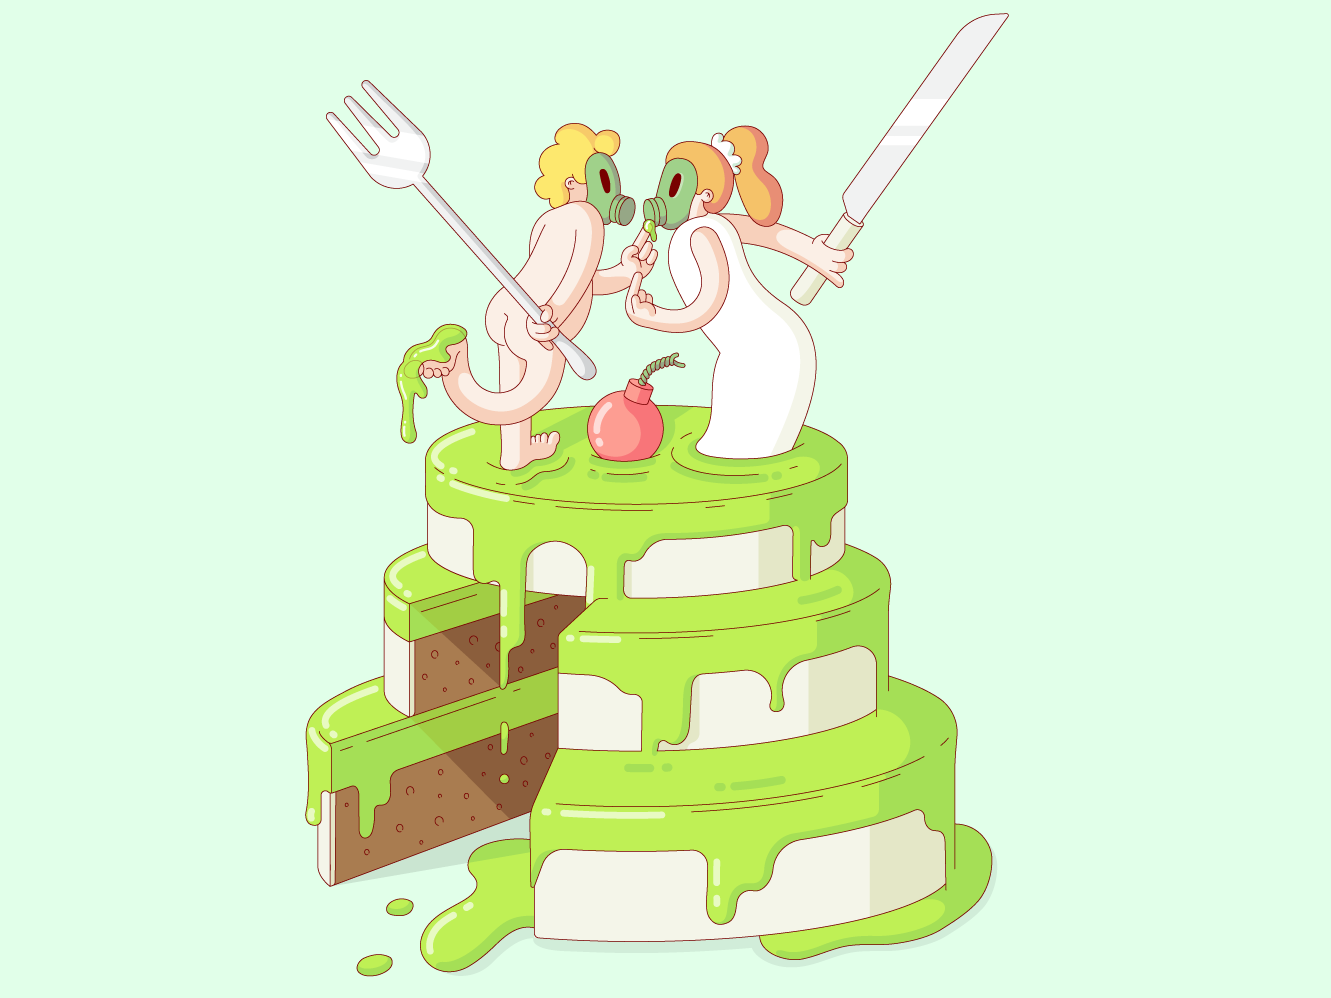 It's Lime slime bomb fork knife wedding cake wedding gas mask love funny drawing vector illustration design